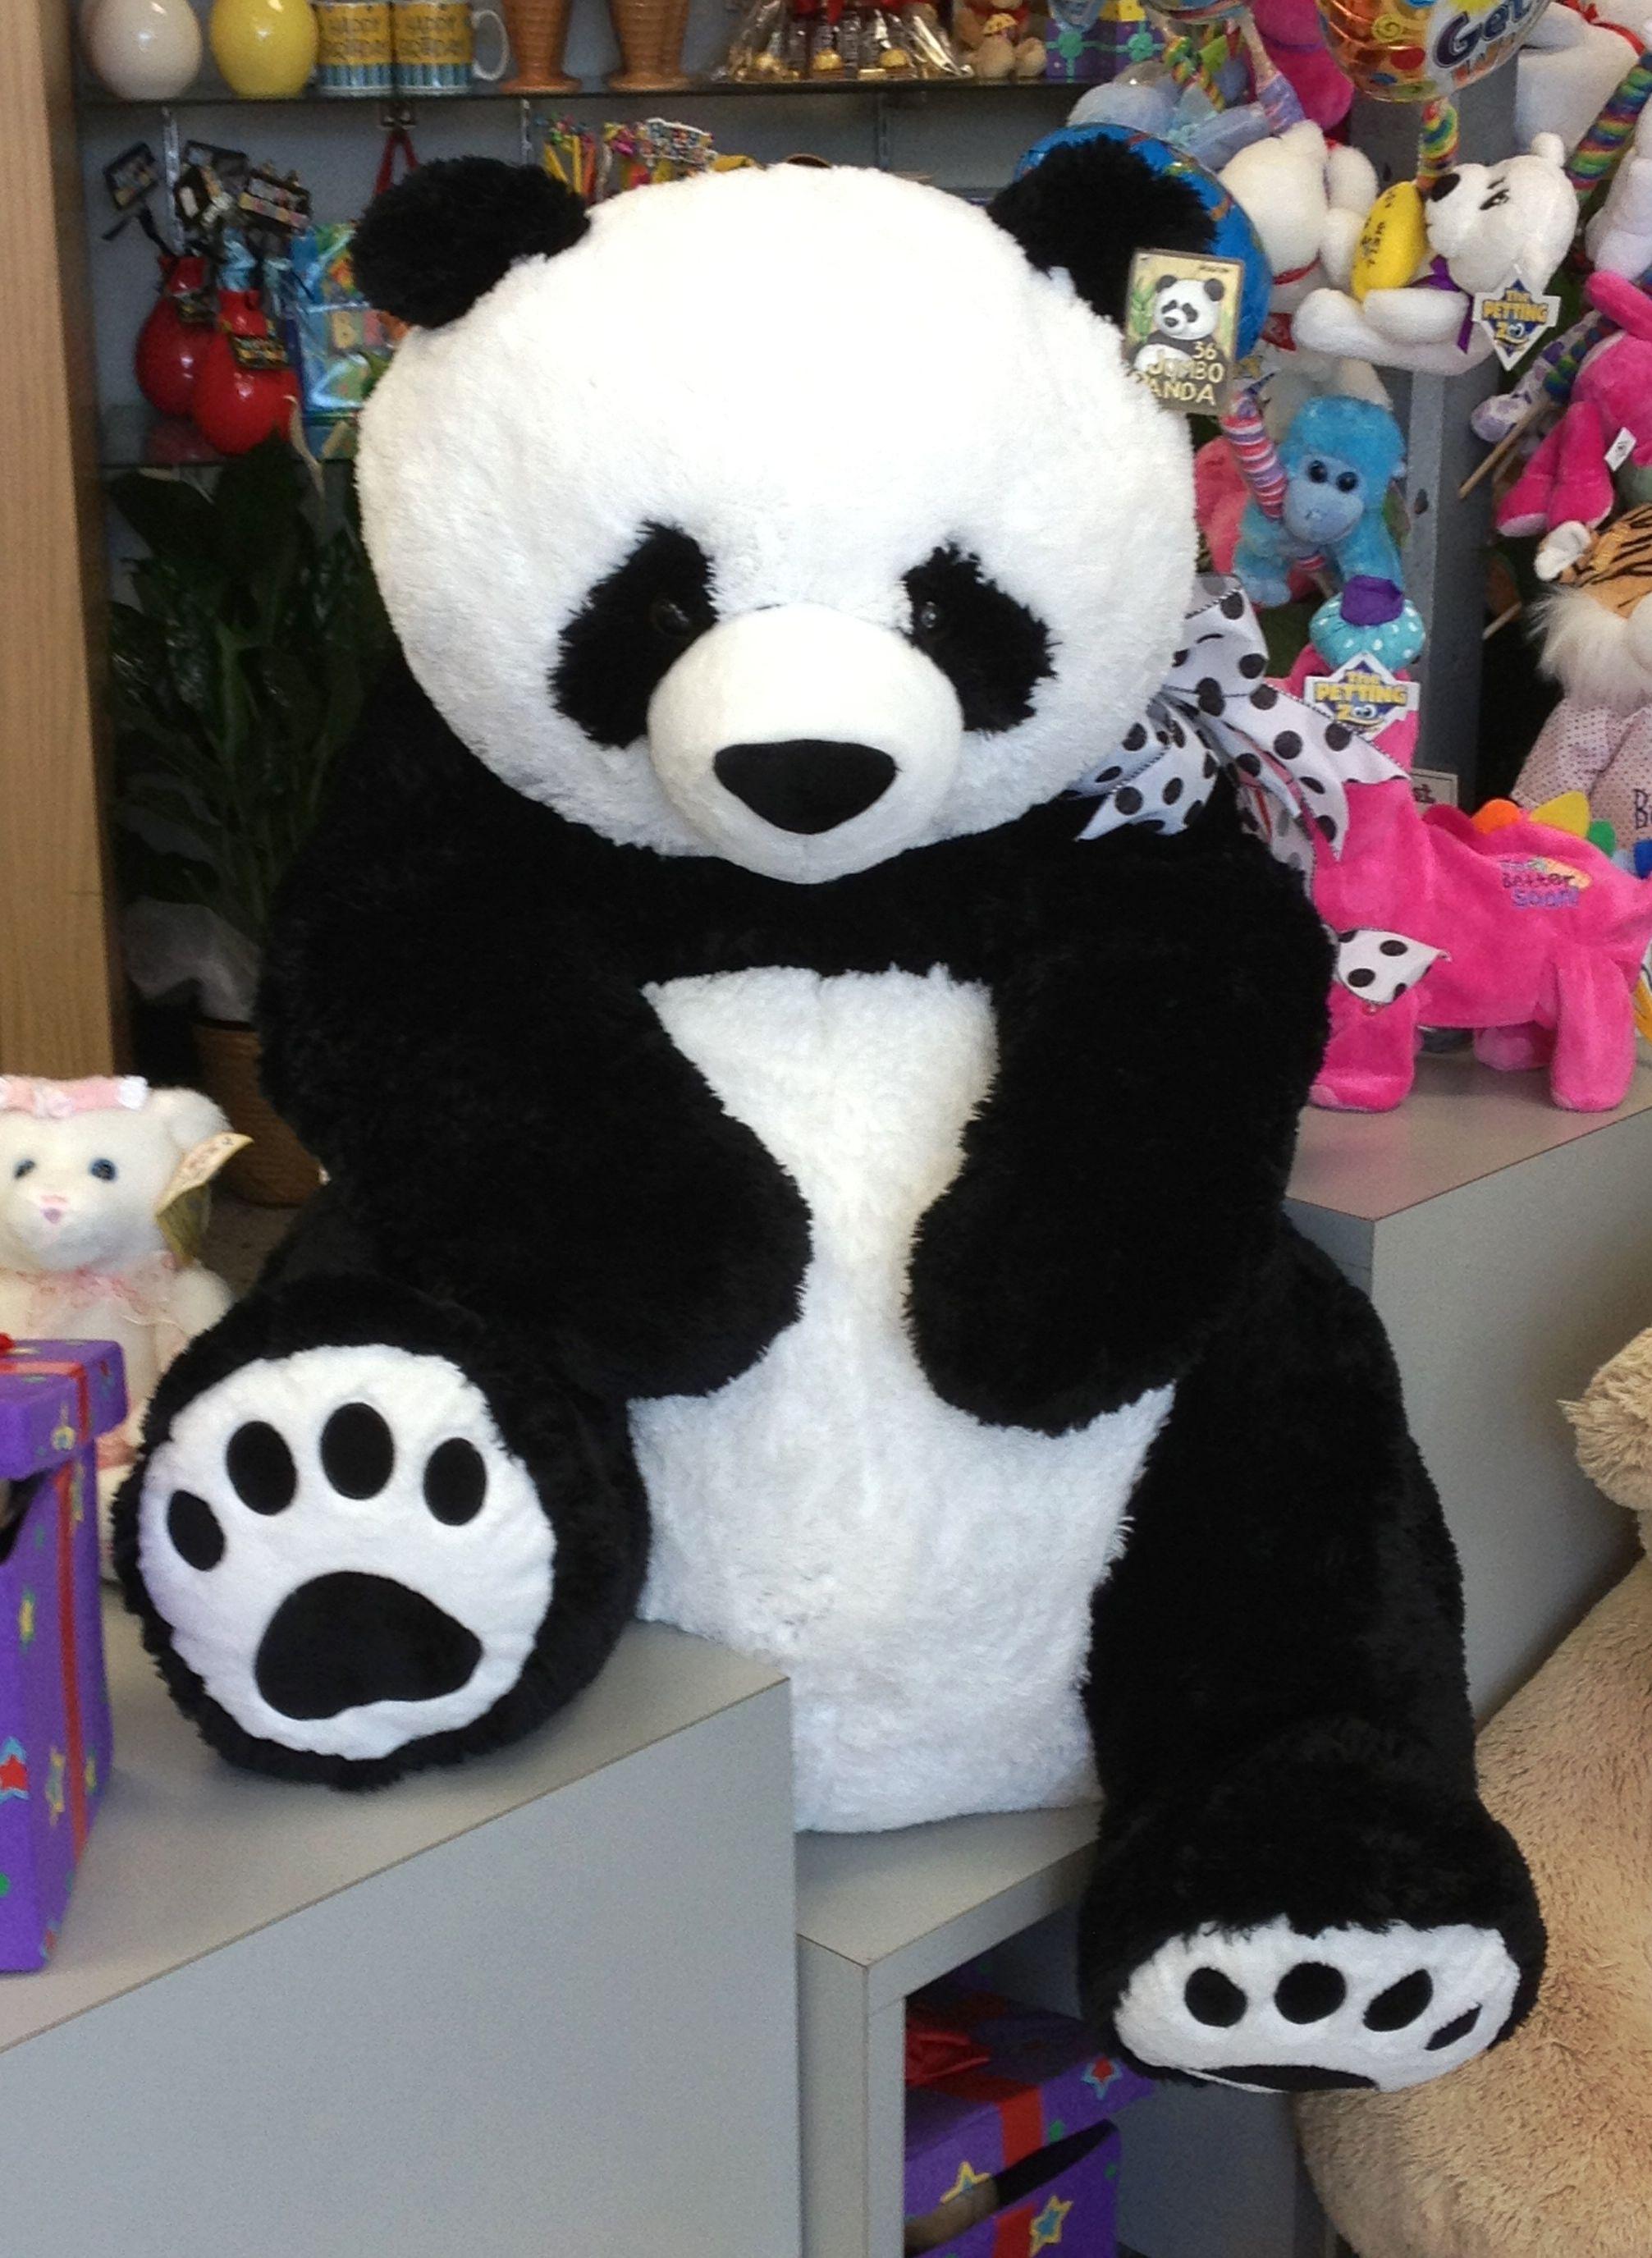 Petal's new friend Jumbo It's PANDA-MODIUM here at Norfolk Florist. Stop in to visit our new Panda